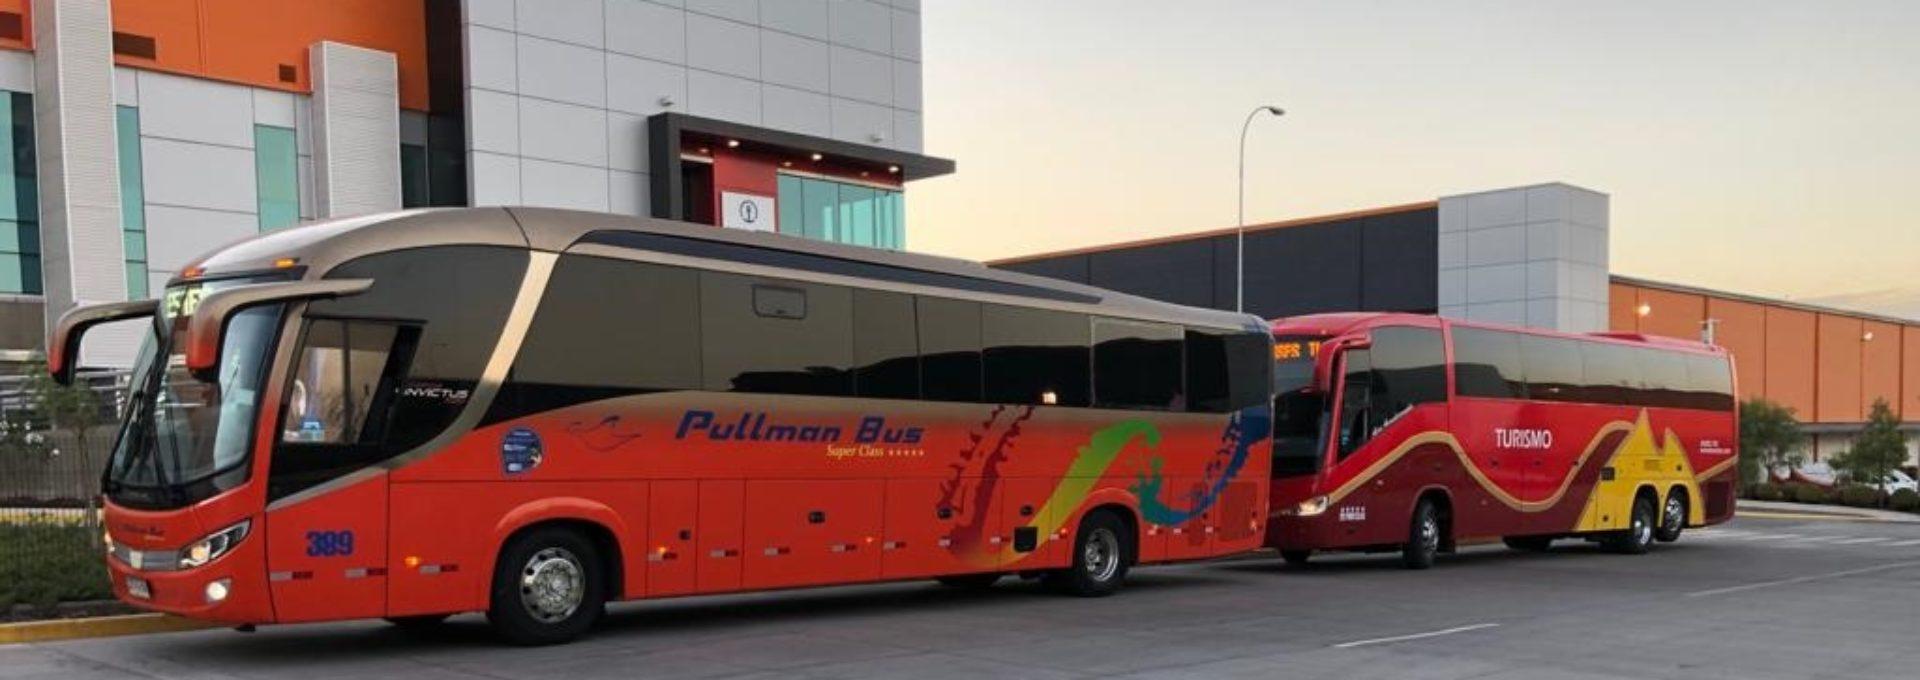 Transporte privado de Pasajeros